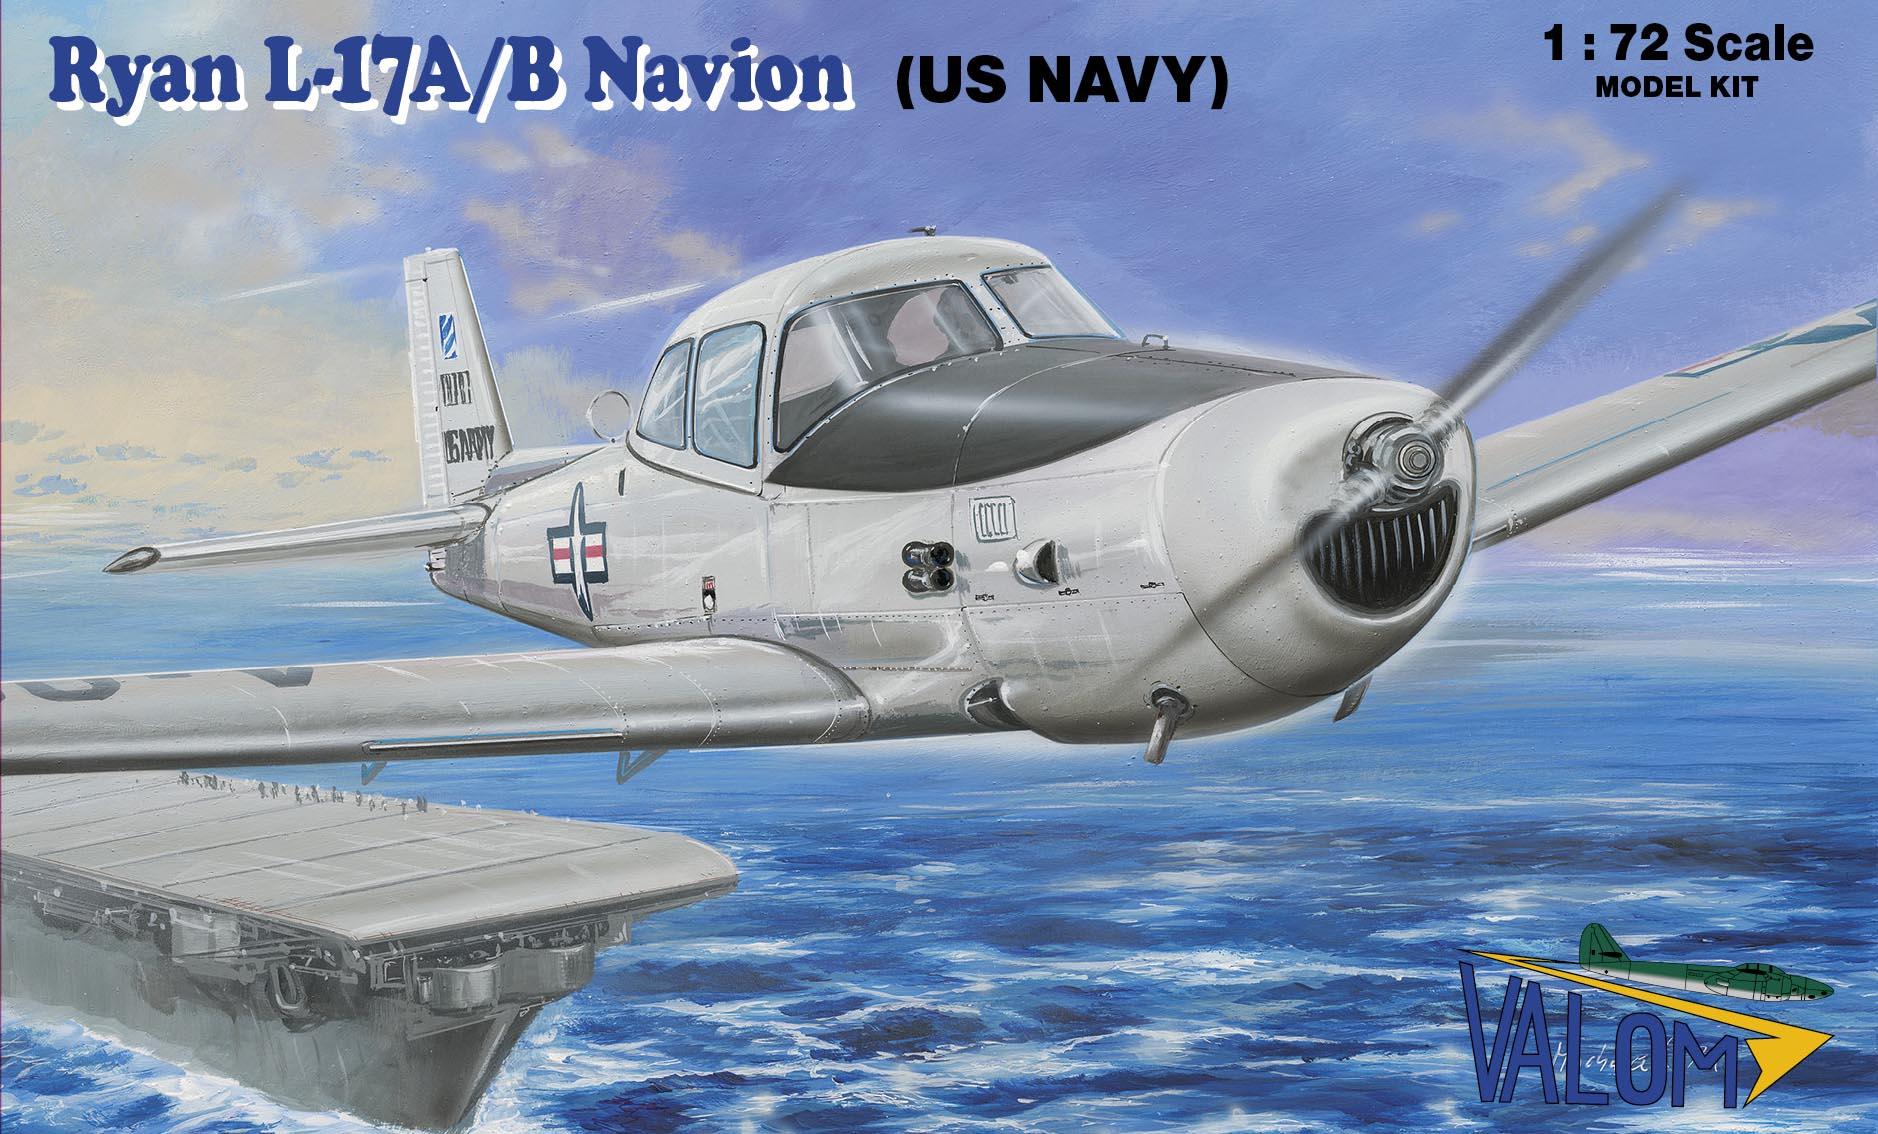 Valom Ryan L-17 A/B Navion (US NAVY)